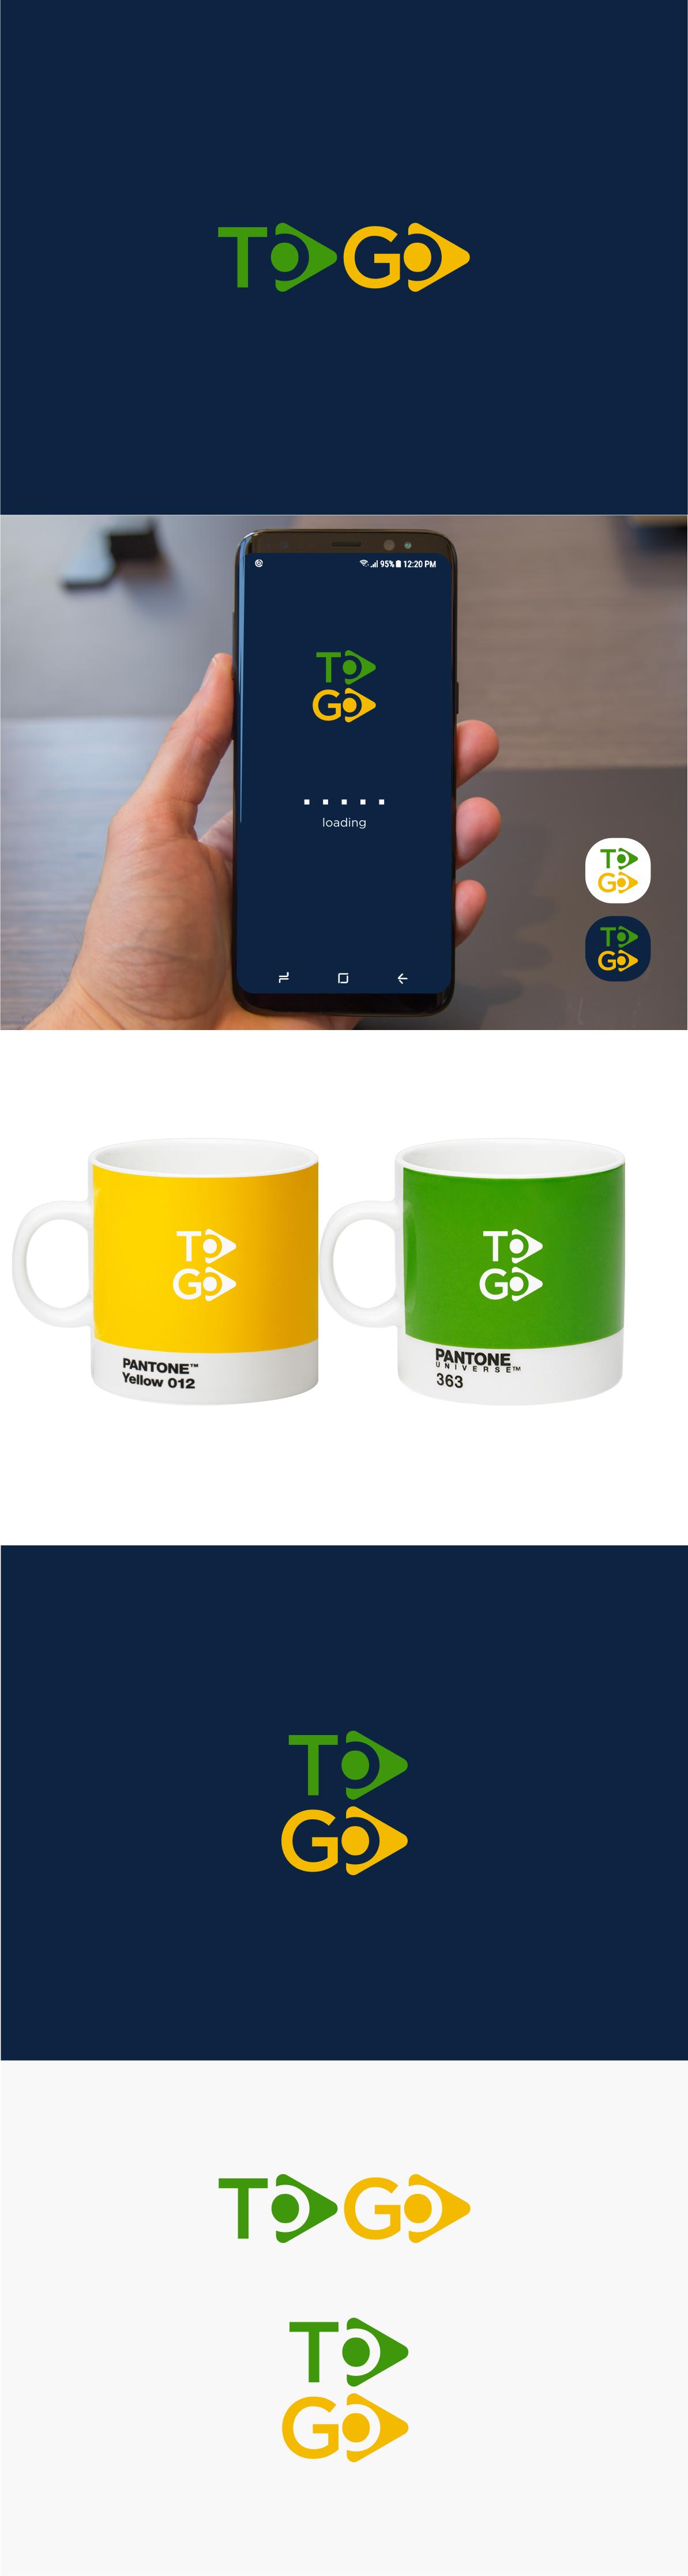 Разработать логотип и экран загрузки приложения фото f_7295ad0476adf4c7.png